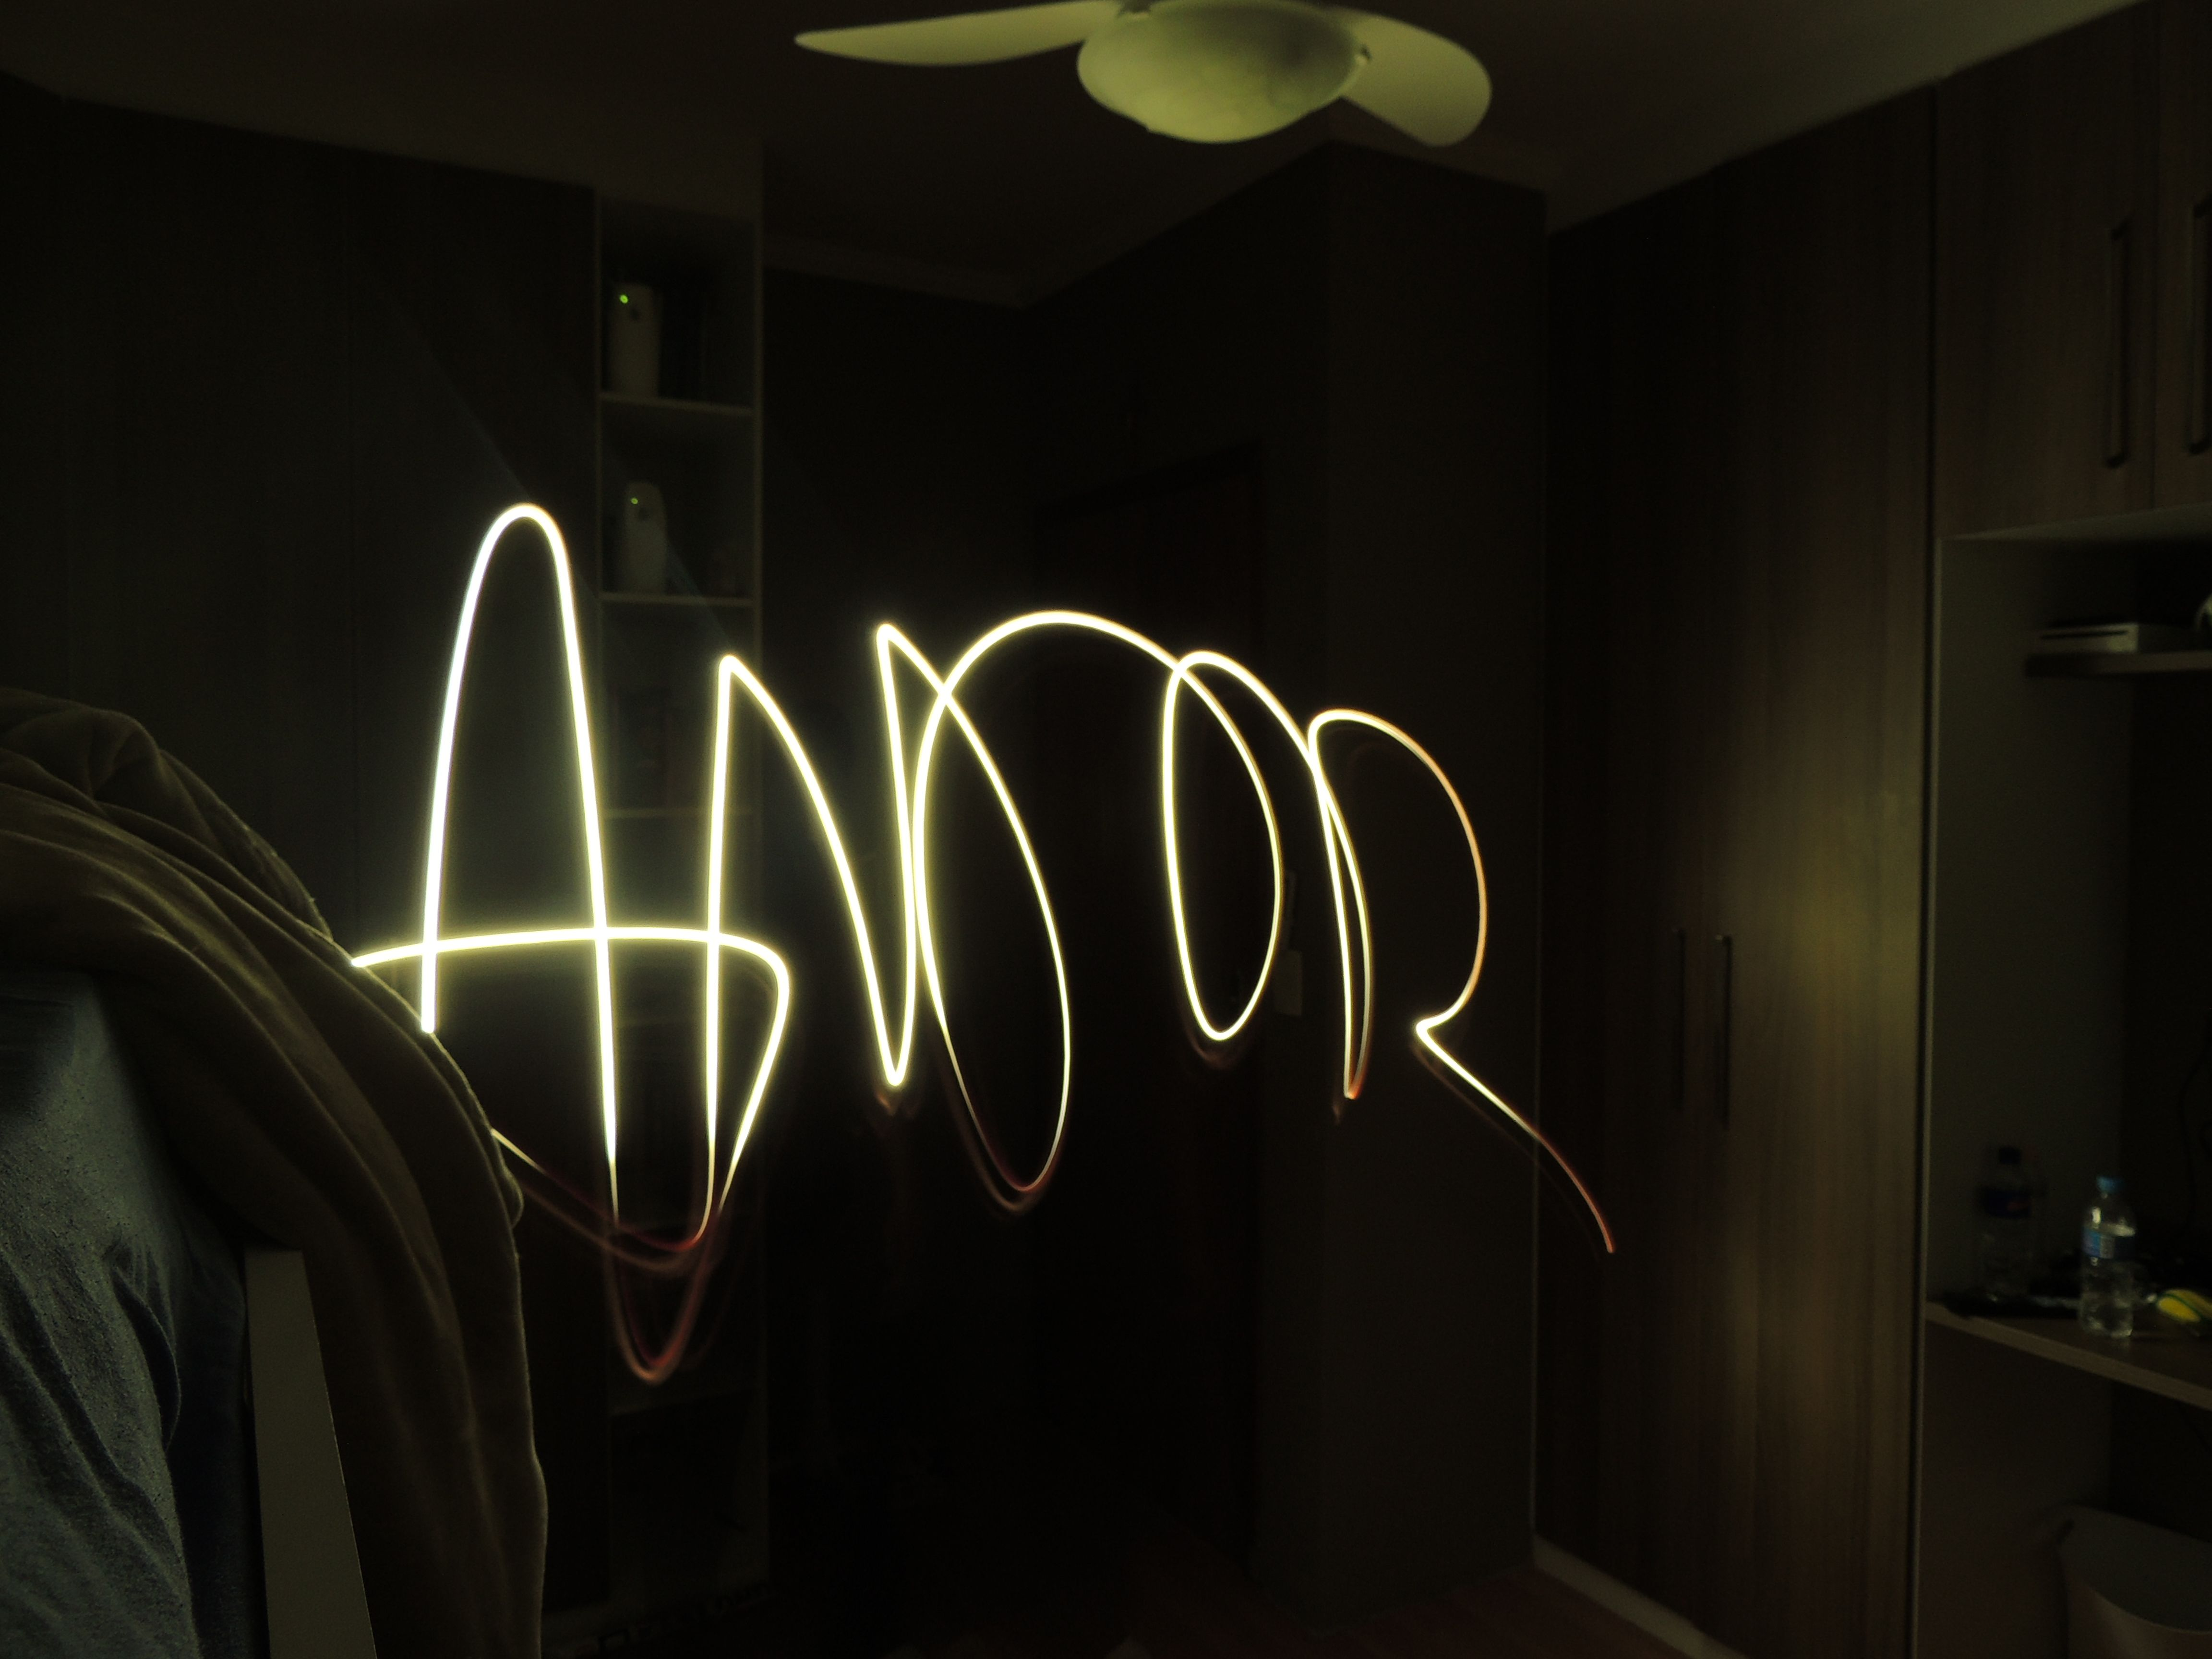 Paintlight in a room - AMOR